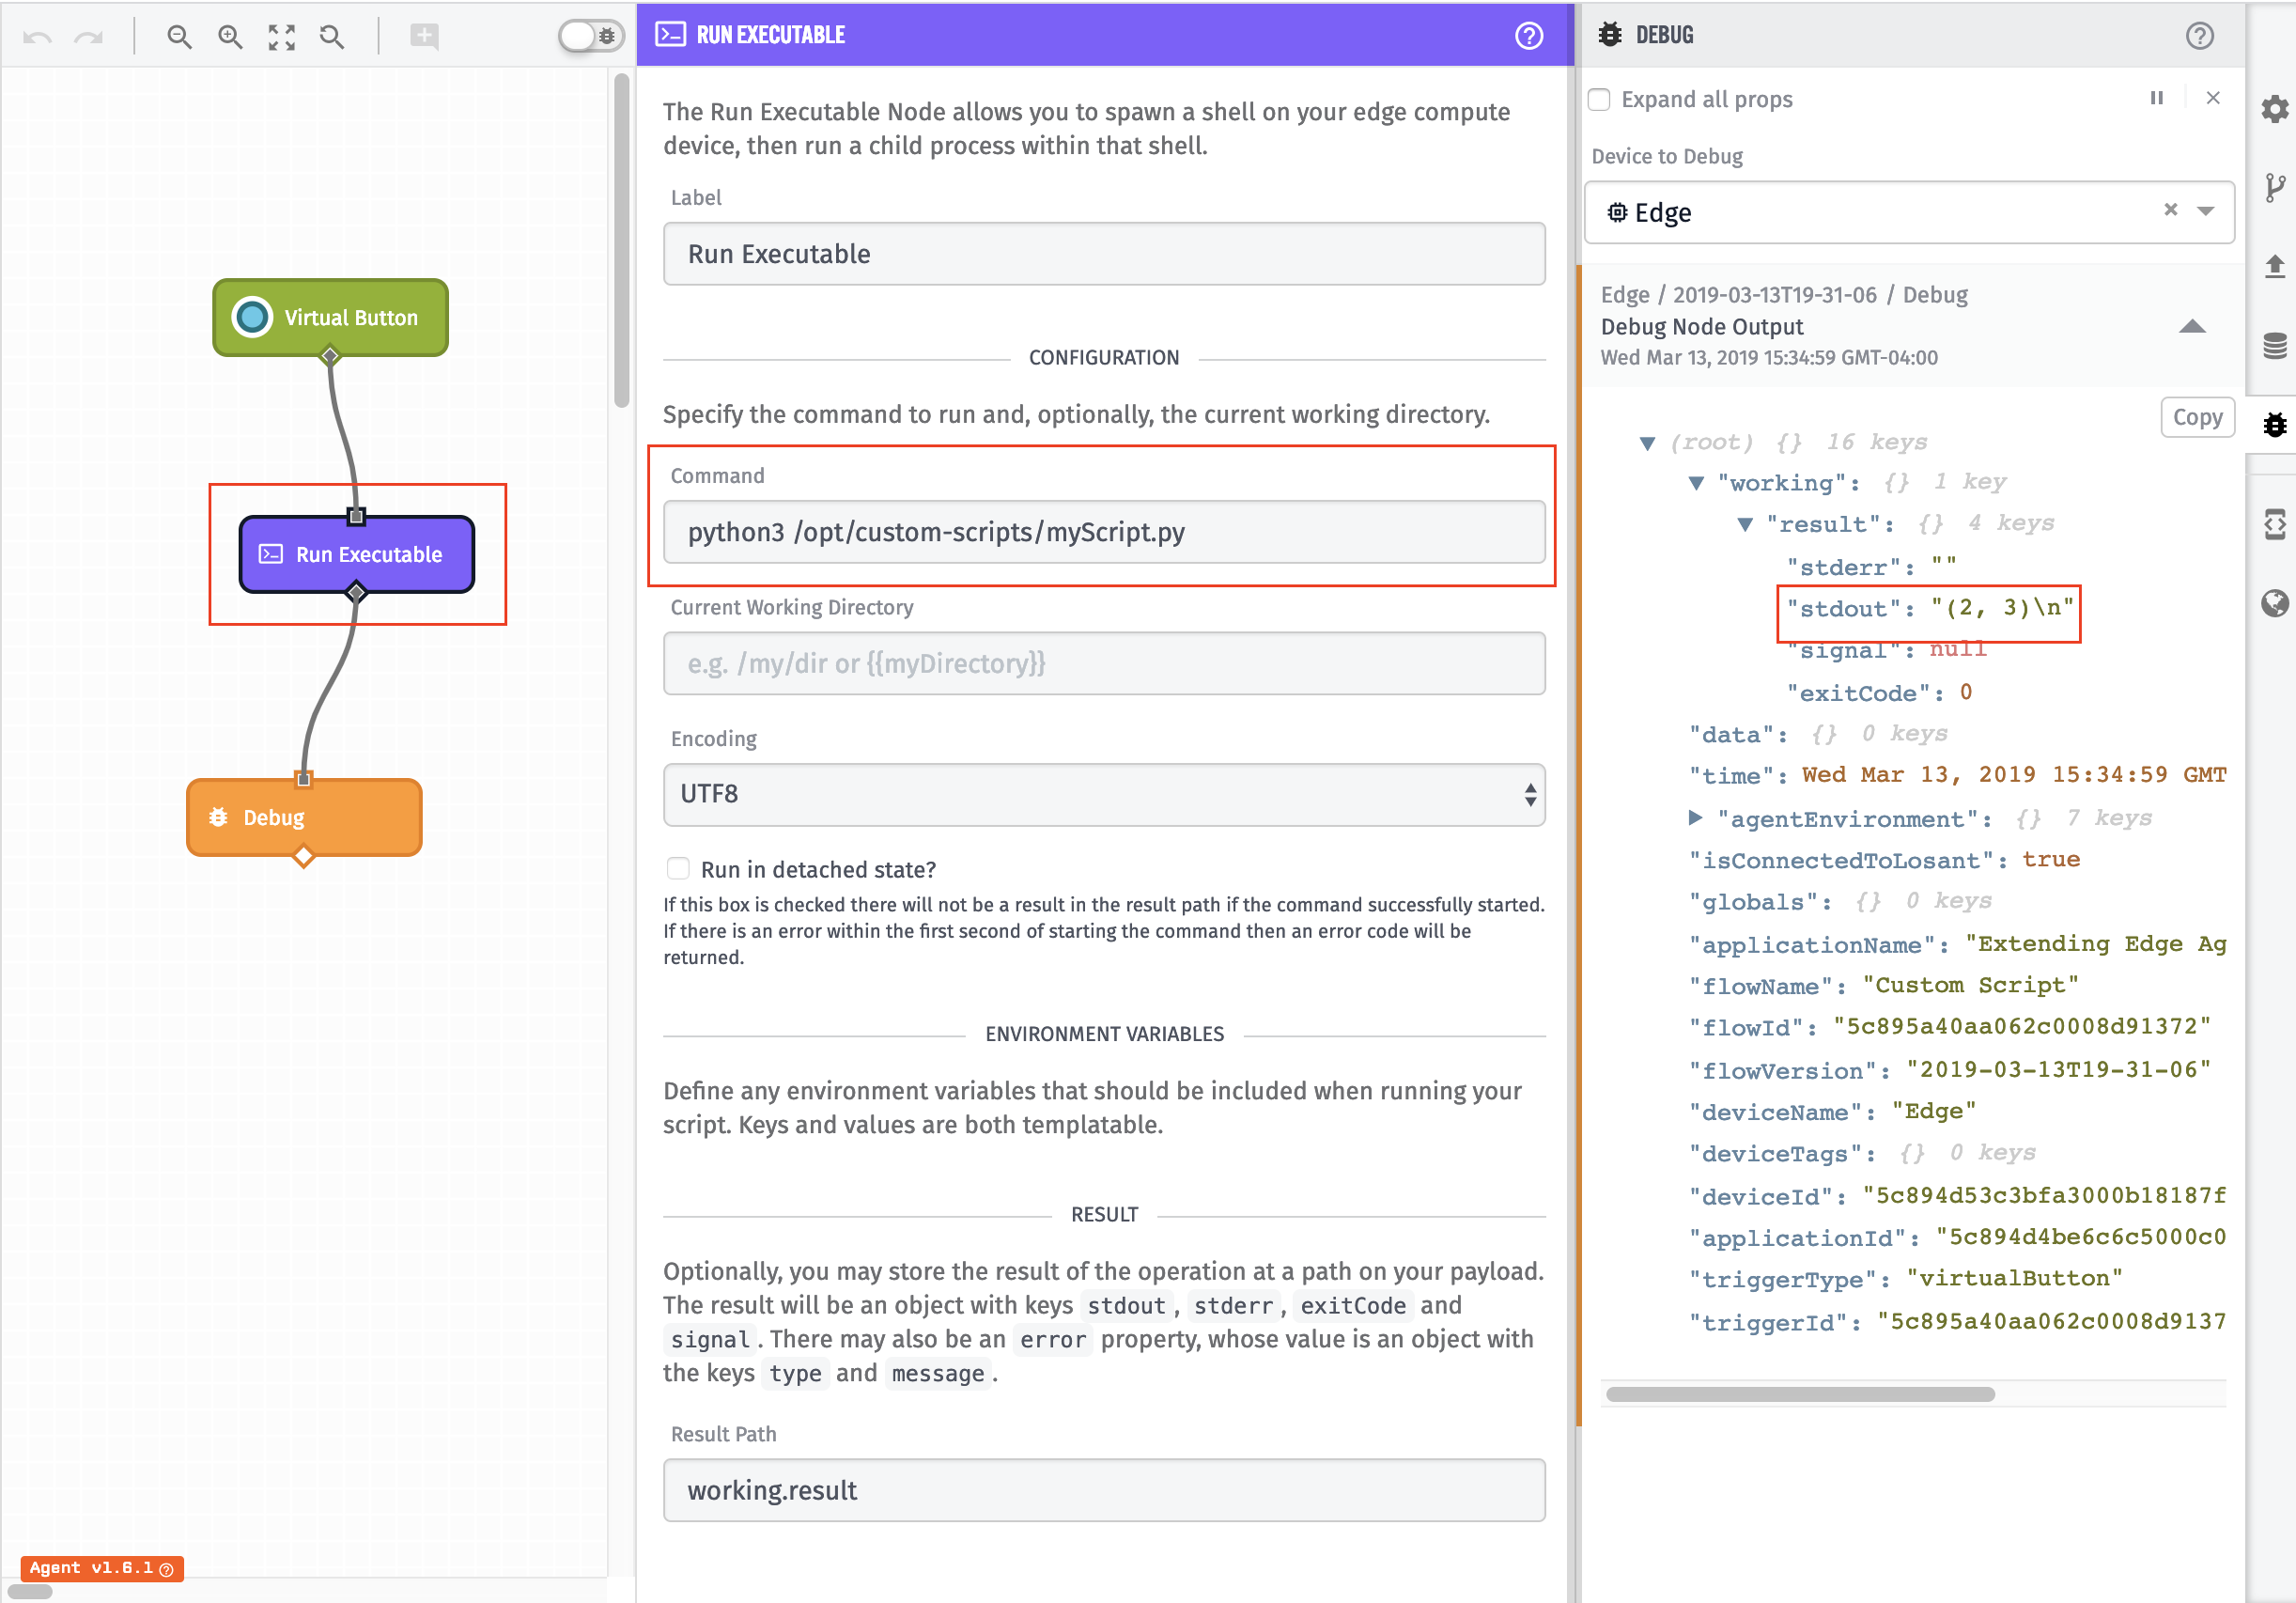 Custom Scripts Example Workflow